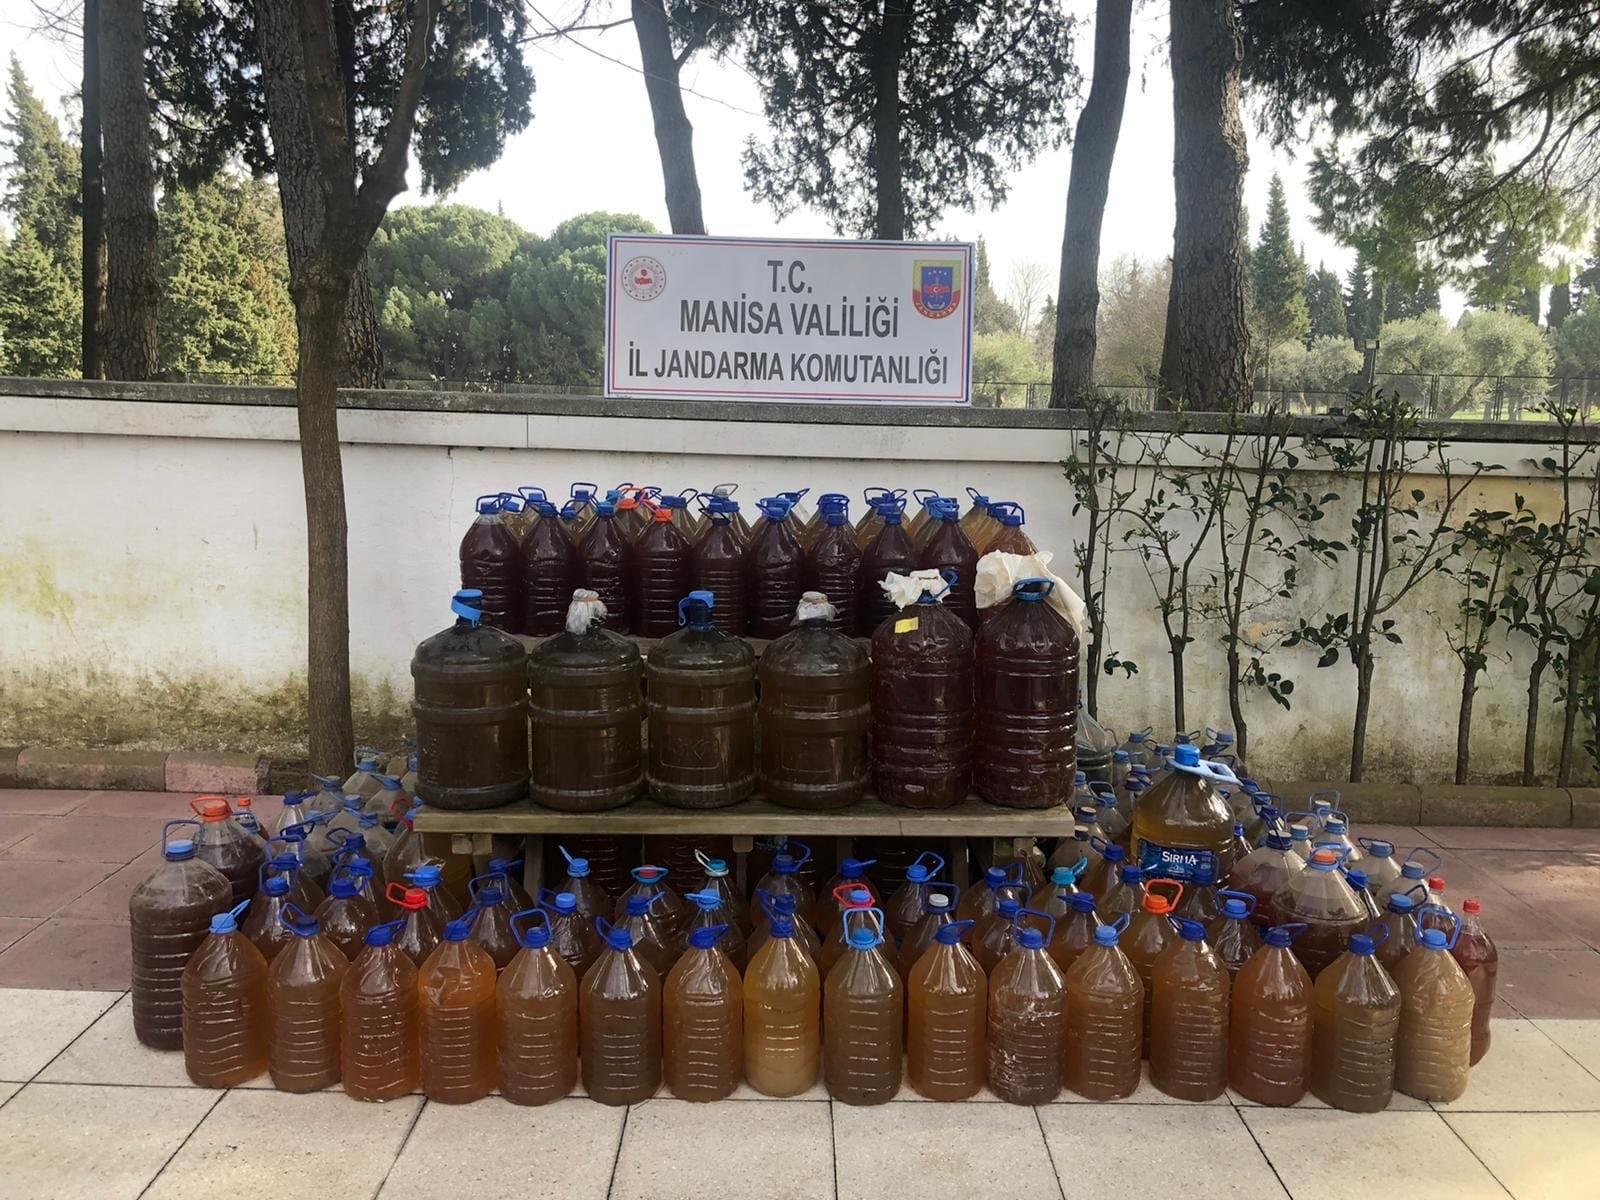 Manisa'da Bin 73 Litre Sahte İçki Ele Geçirildi